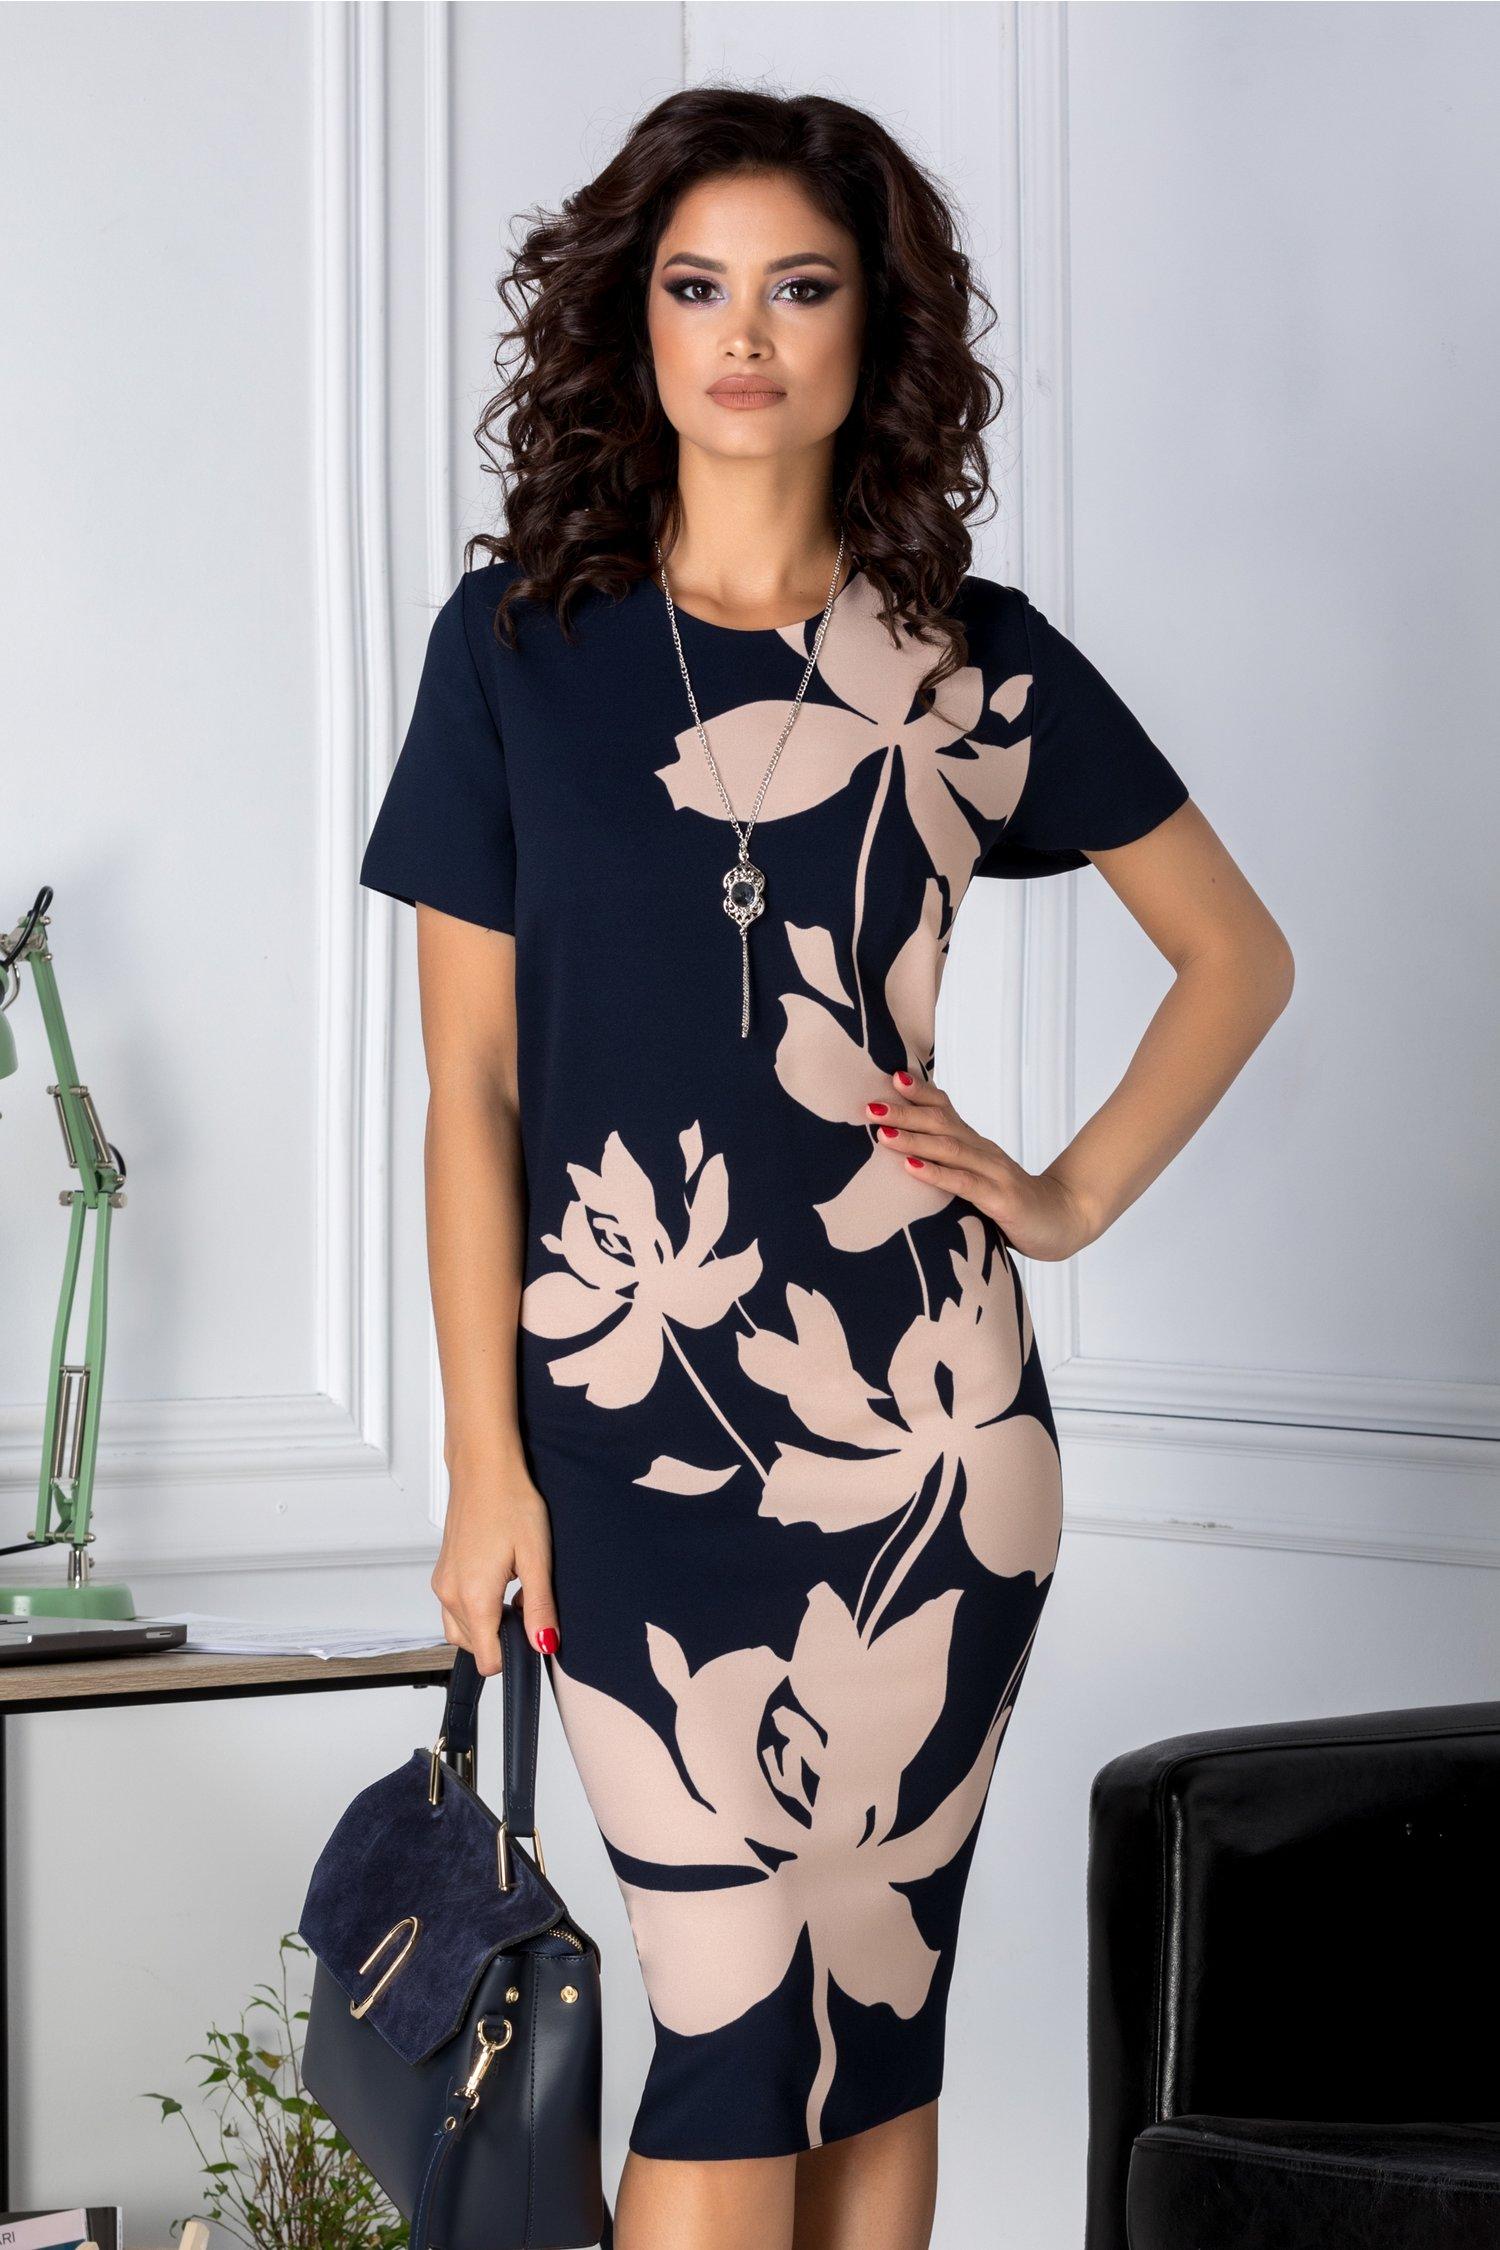 Rochie Marylin bleumarin cu imprimeu floral crem